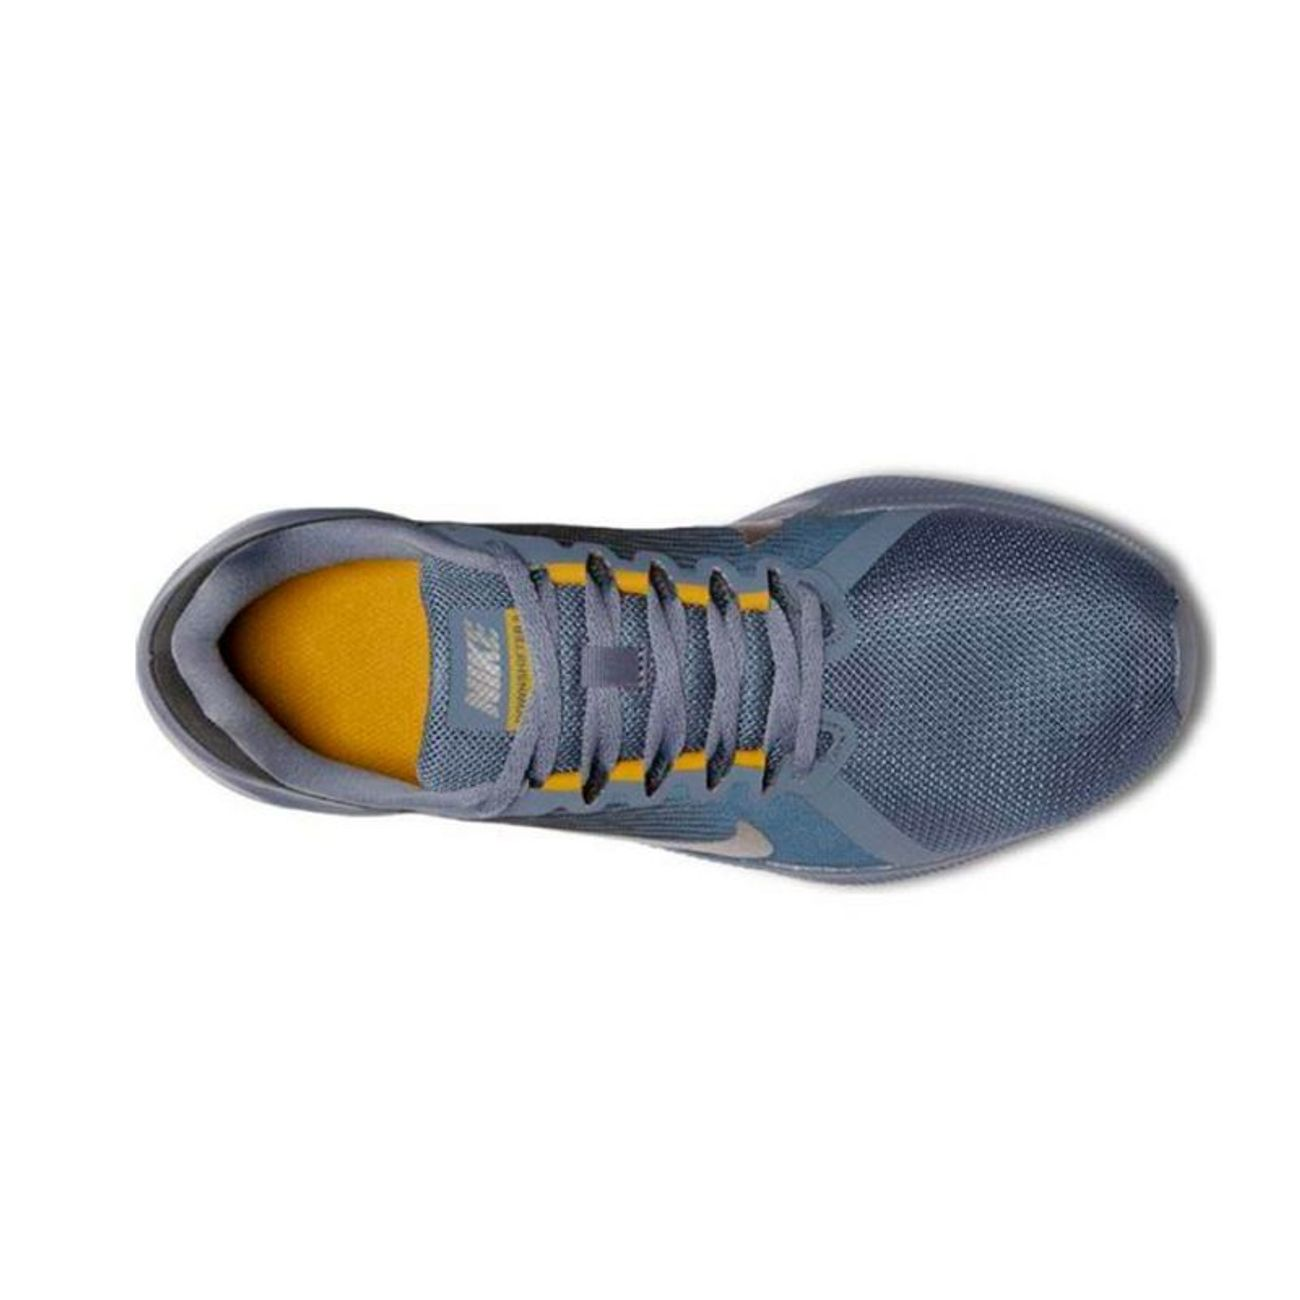 8 Noir Nike Downshifter Ni908984 011 Gris Running Adulte q54Lc3ARj